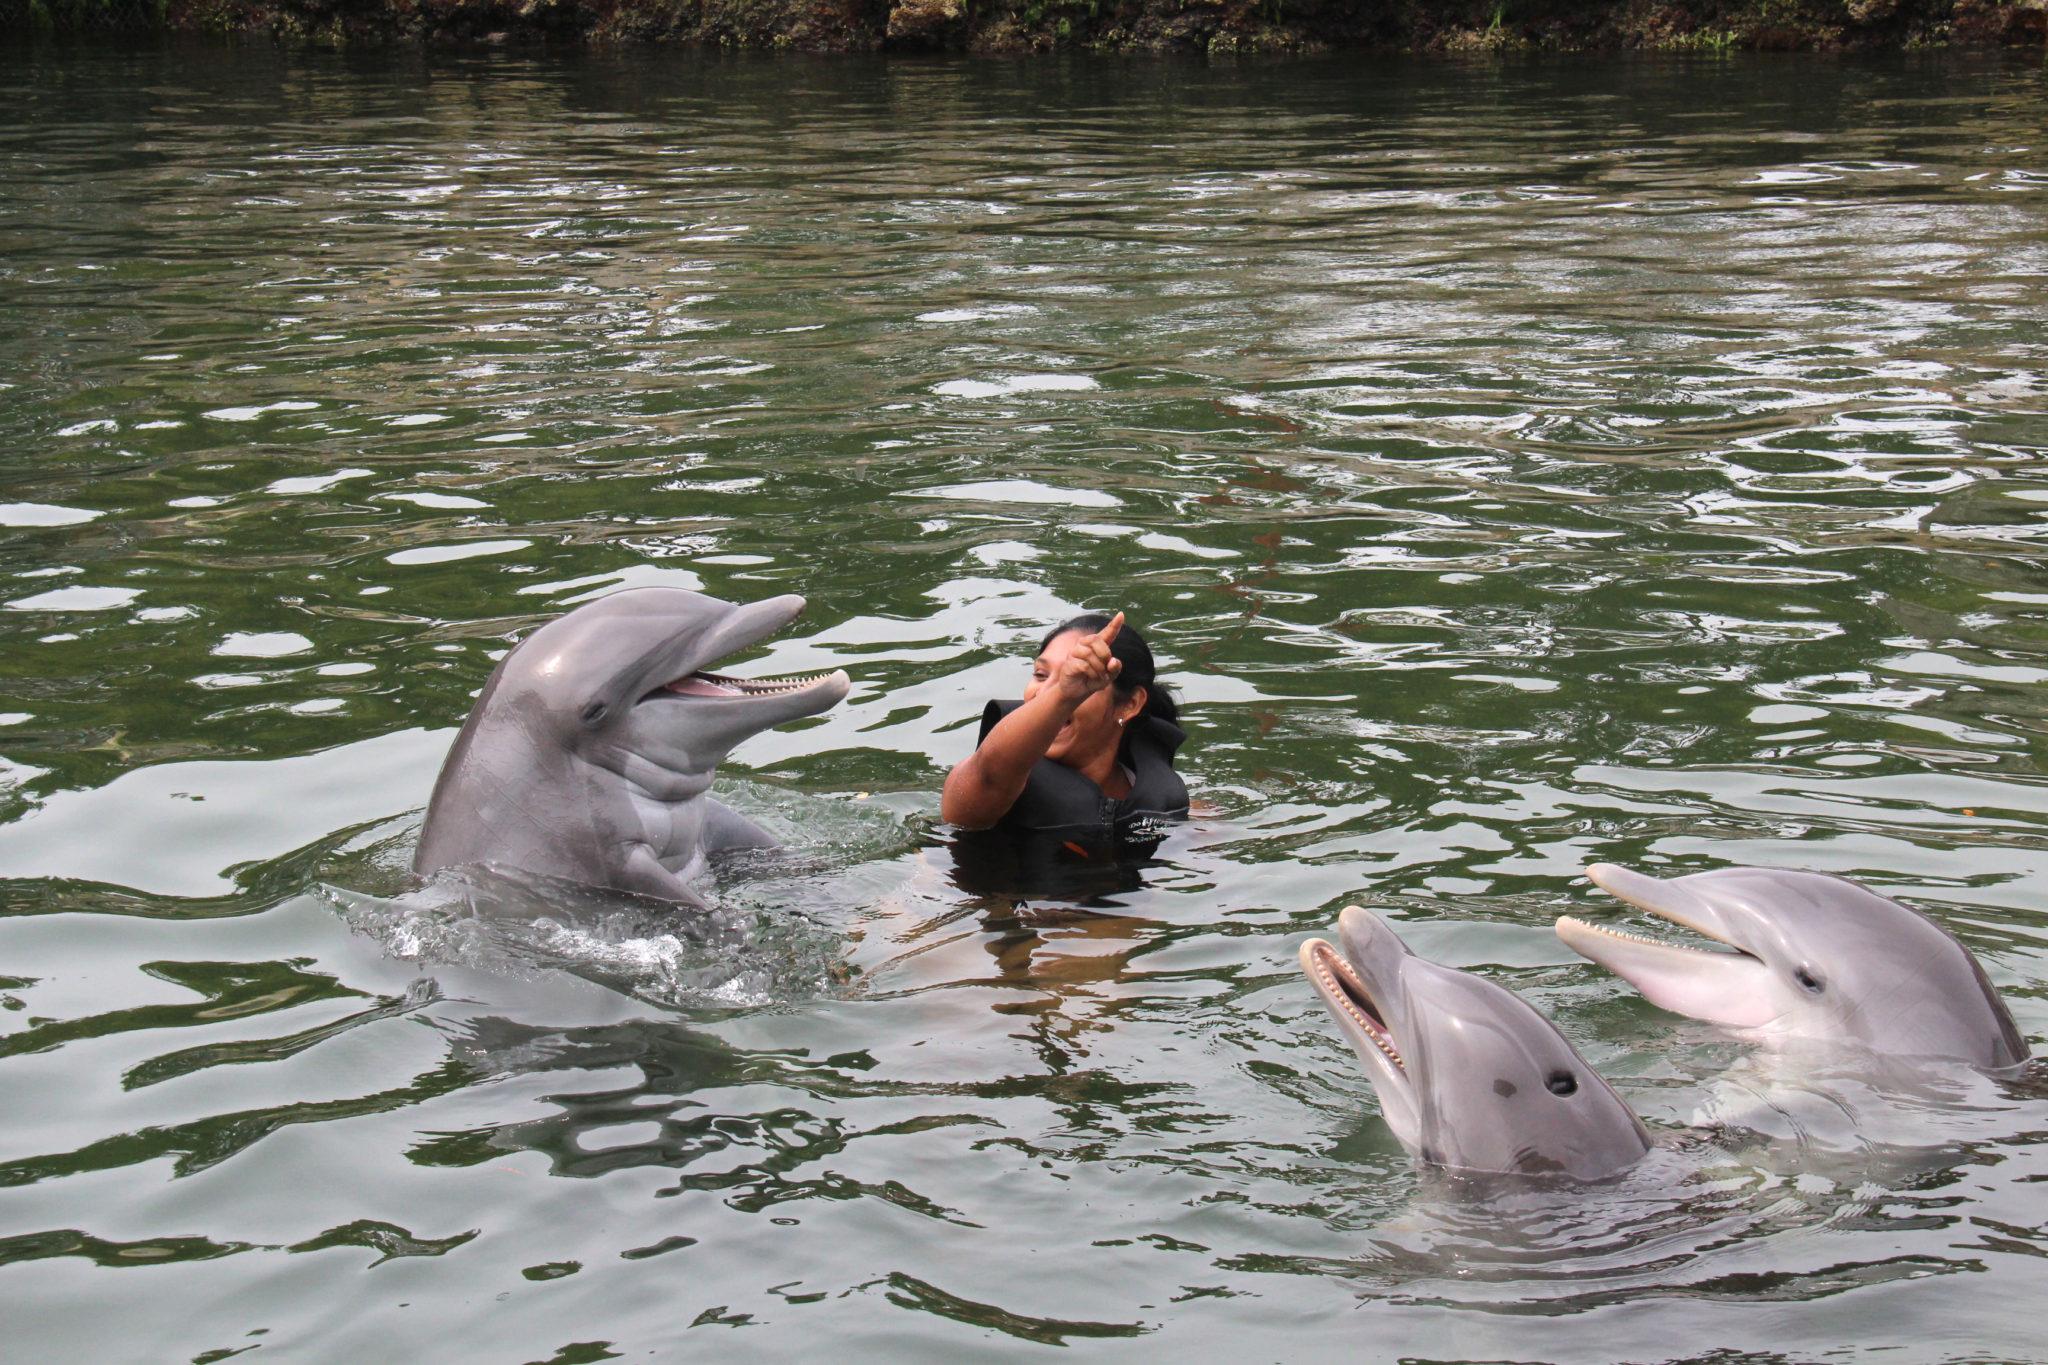 Hema_nager_avec_les_dauphins_dolphin_plus8